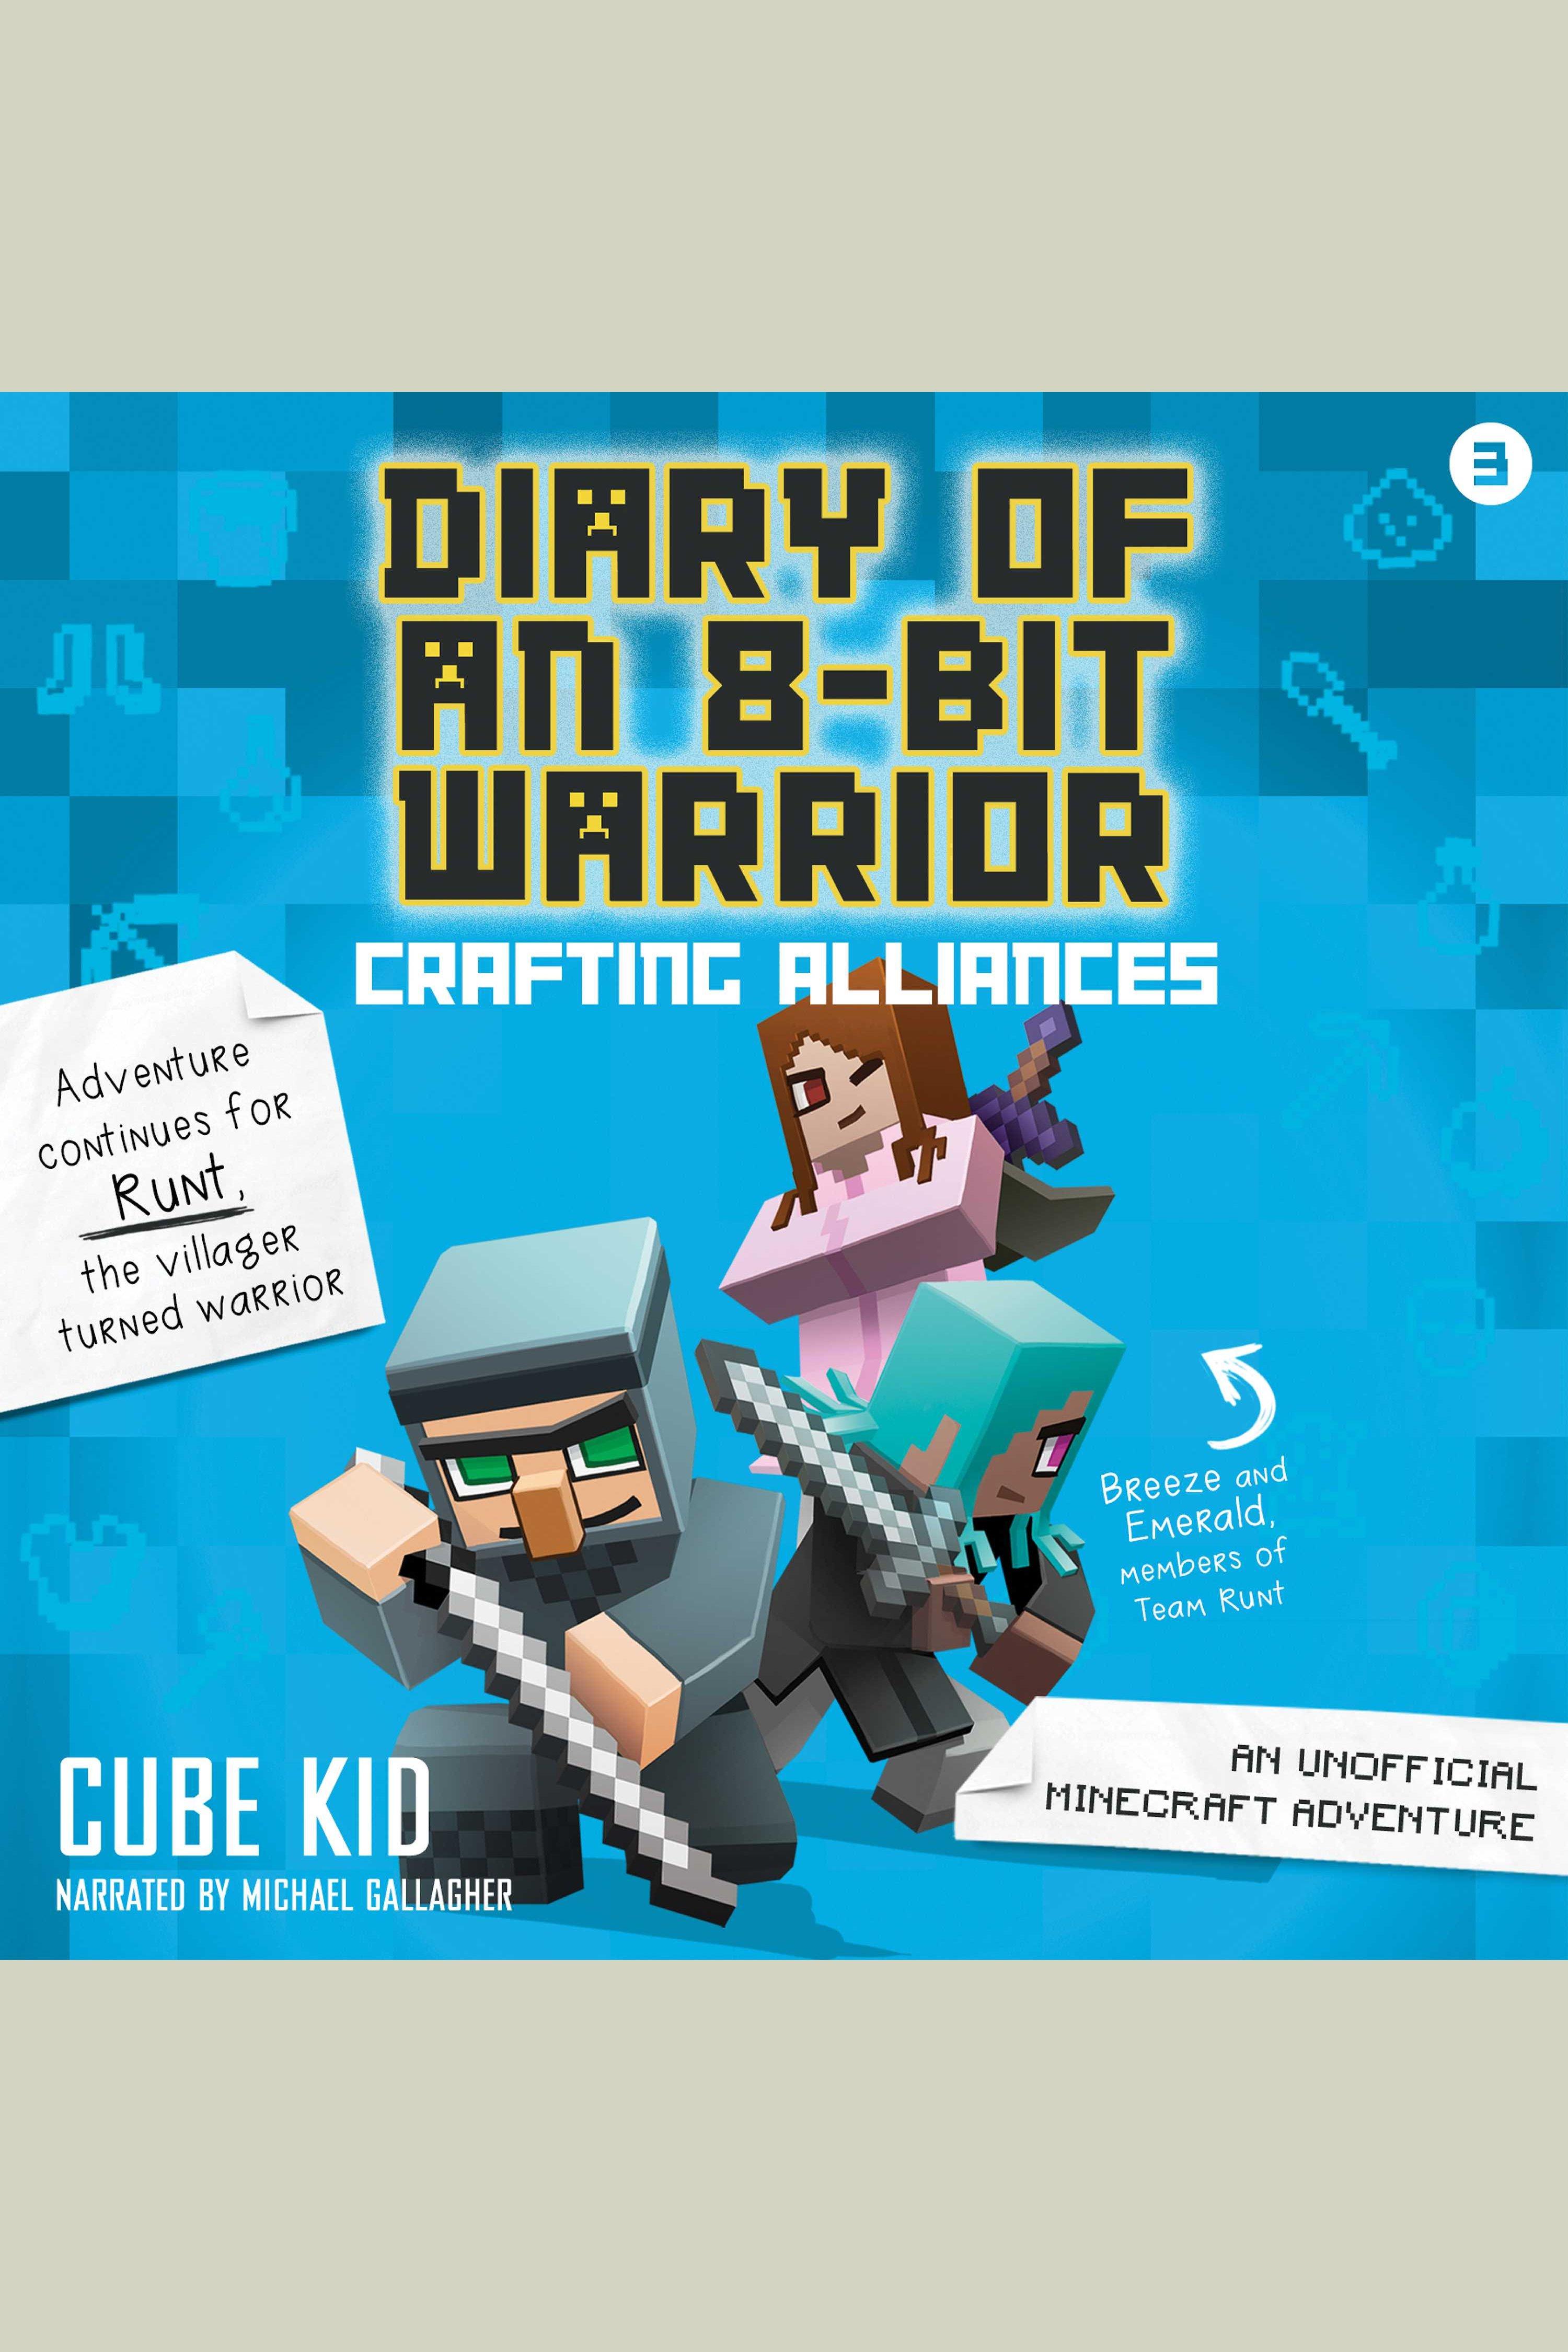 Diary of an 8-Bit Warrior: Crafting Alliances An Unofficial Minecraft Adventure